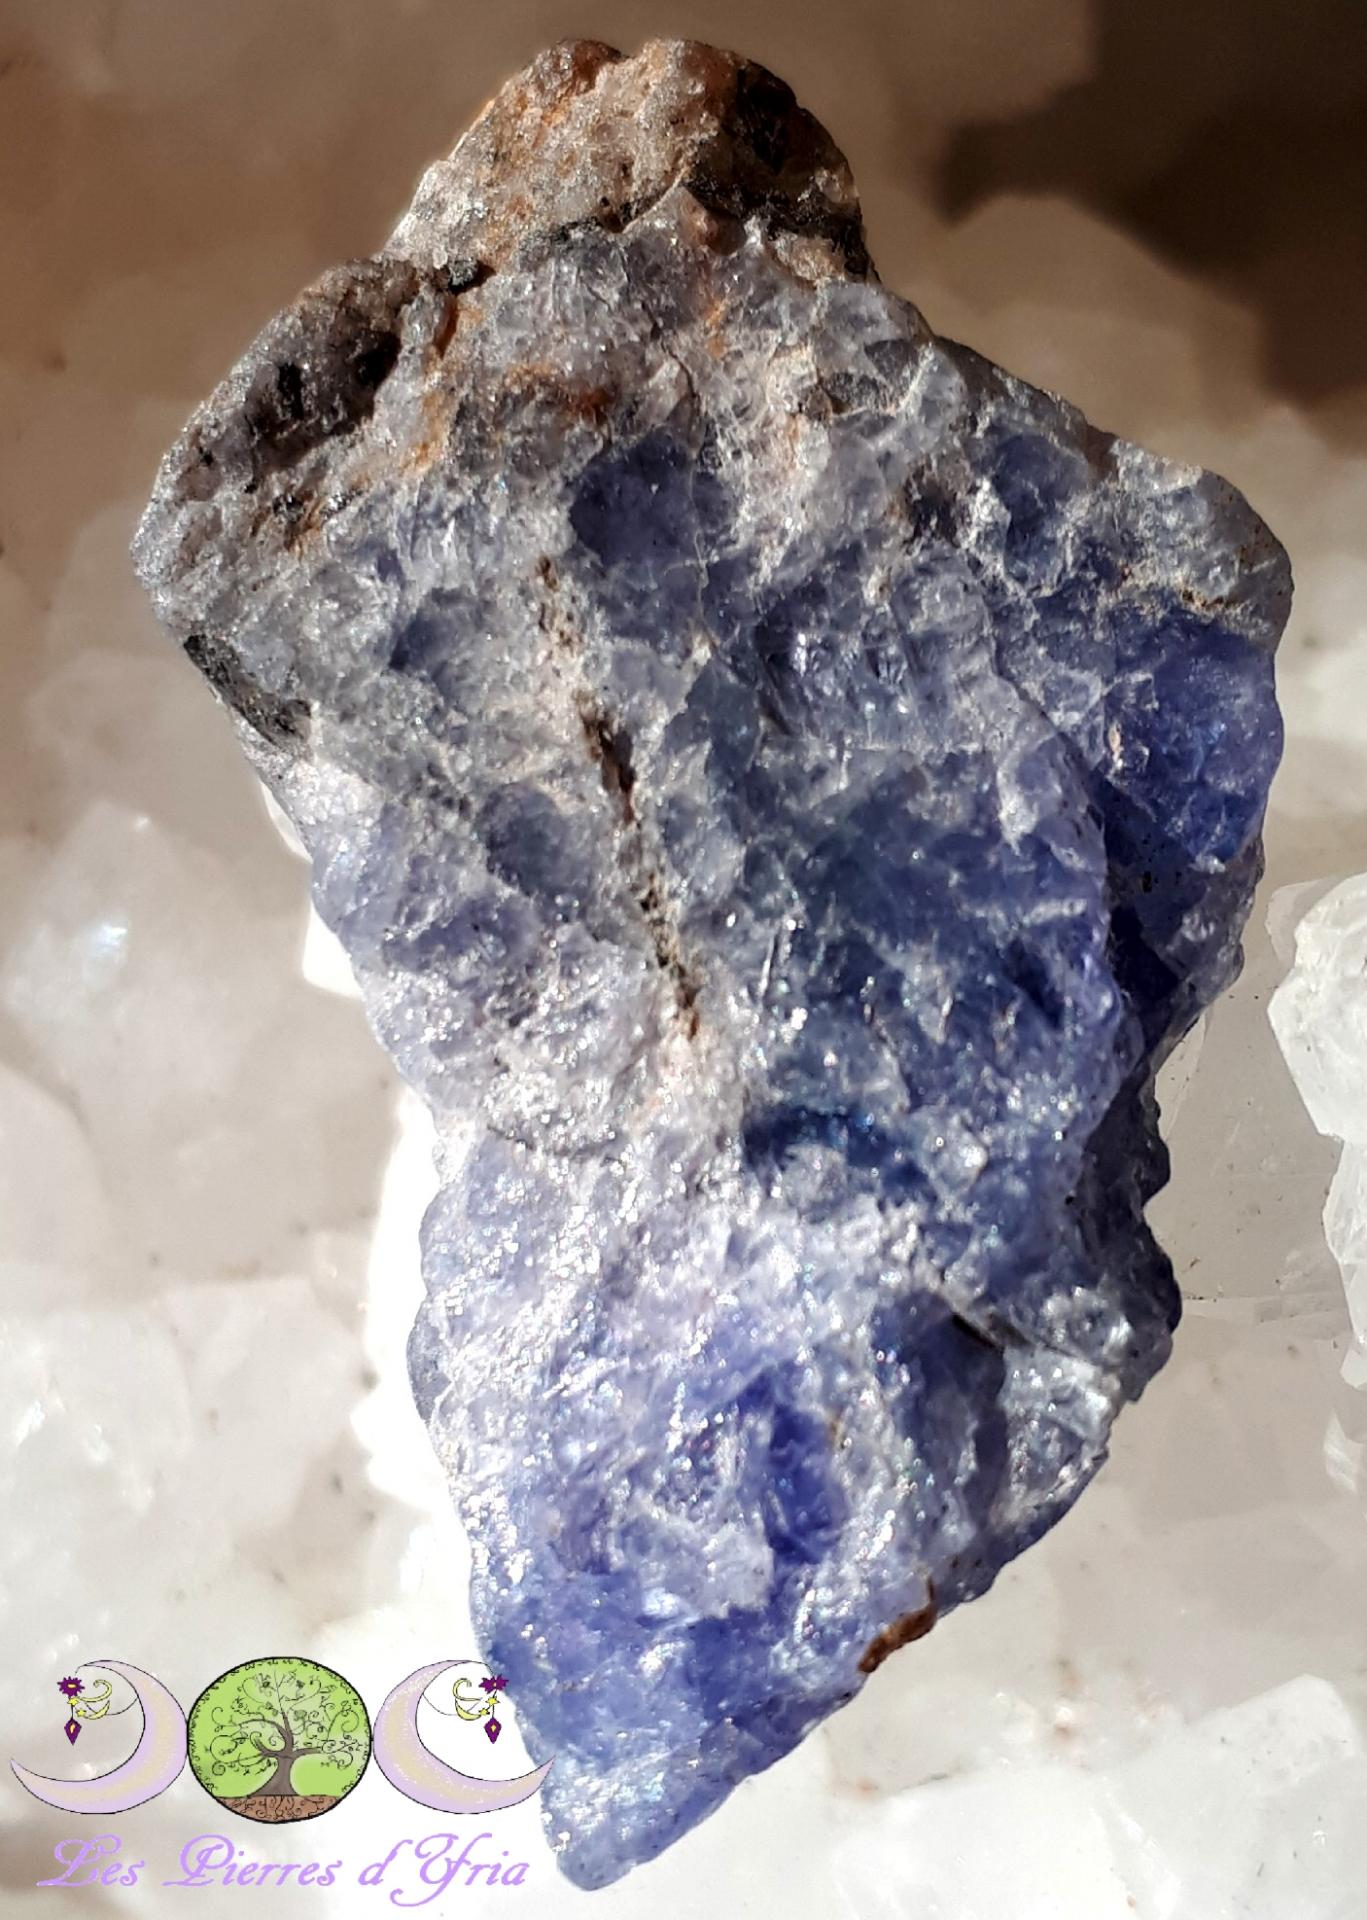 Tanzanite 3 3 gf